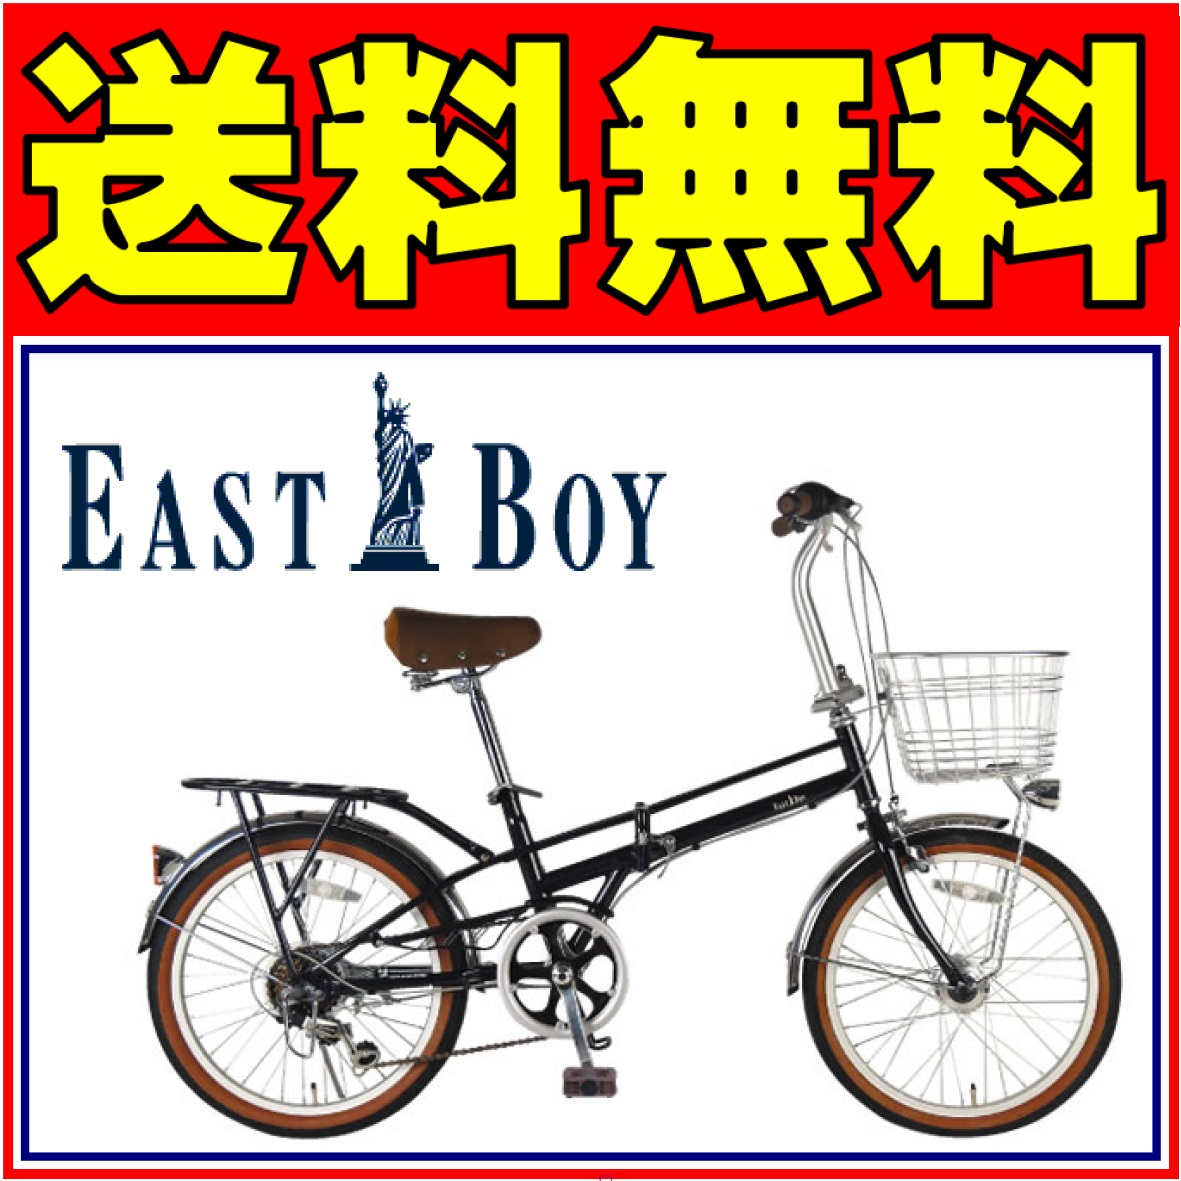 EASTBOY イーストボーイ 自転車 シティサイクル ネイビー 女子高生、女子中学生の通学に最適 折りたたみ 外装6段ギア シティ車 20インチ LEDオートライト イーストボーイ 自転車